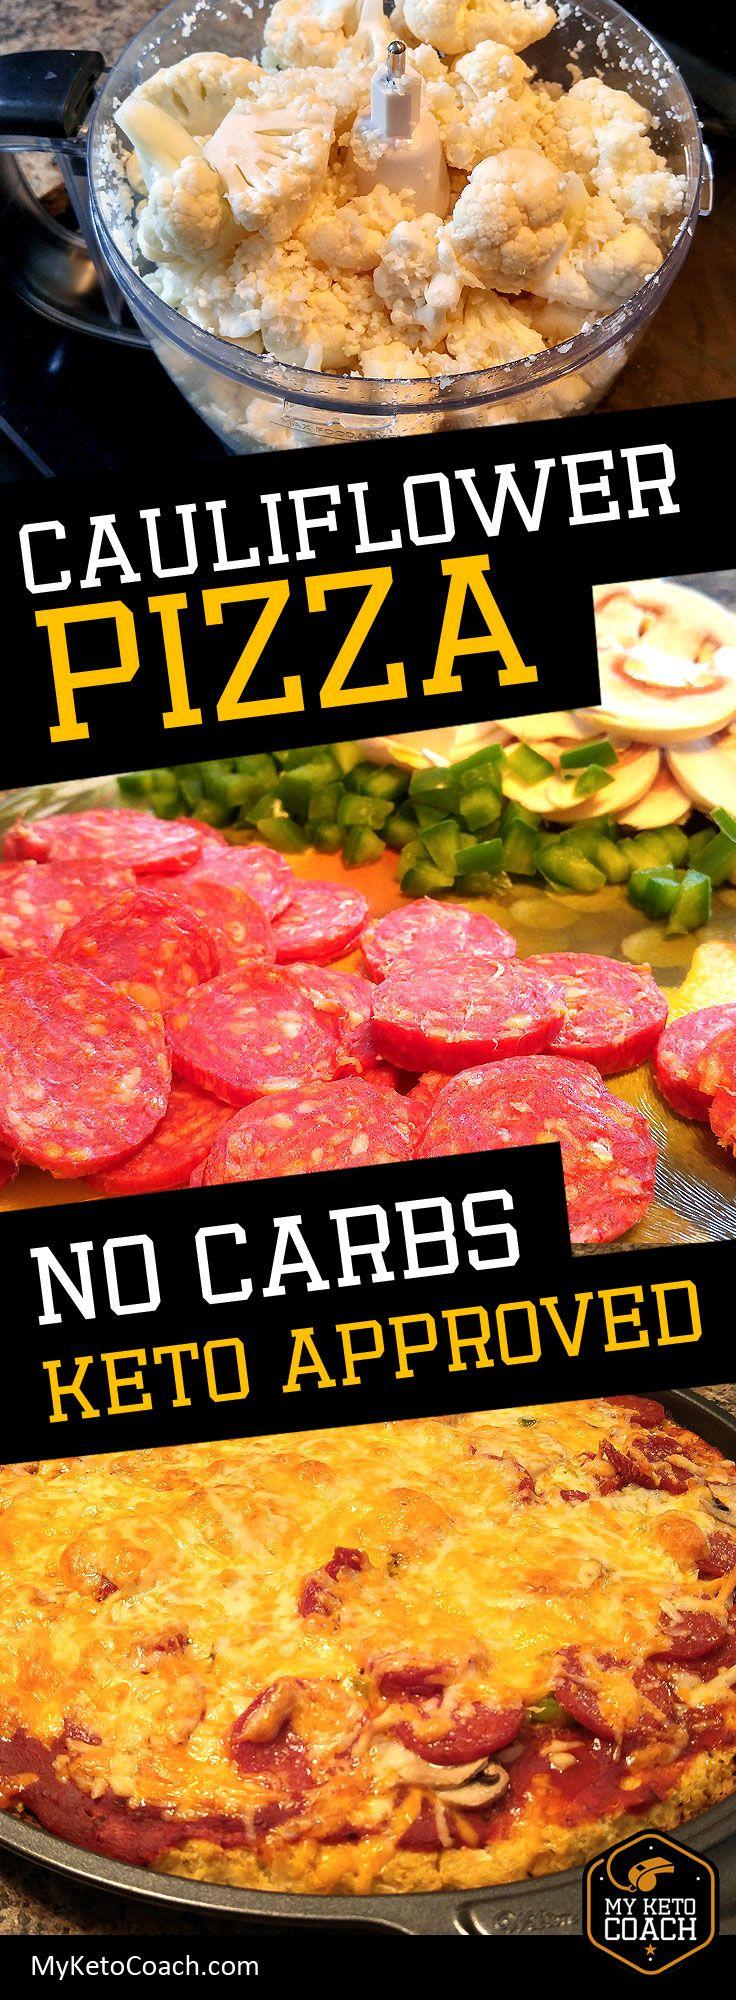 Blue apron cauliflower pizza - Cauliflower Pizza No Carbs Pizza Tastes Amazing It S A Labor Of Love